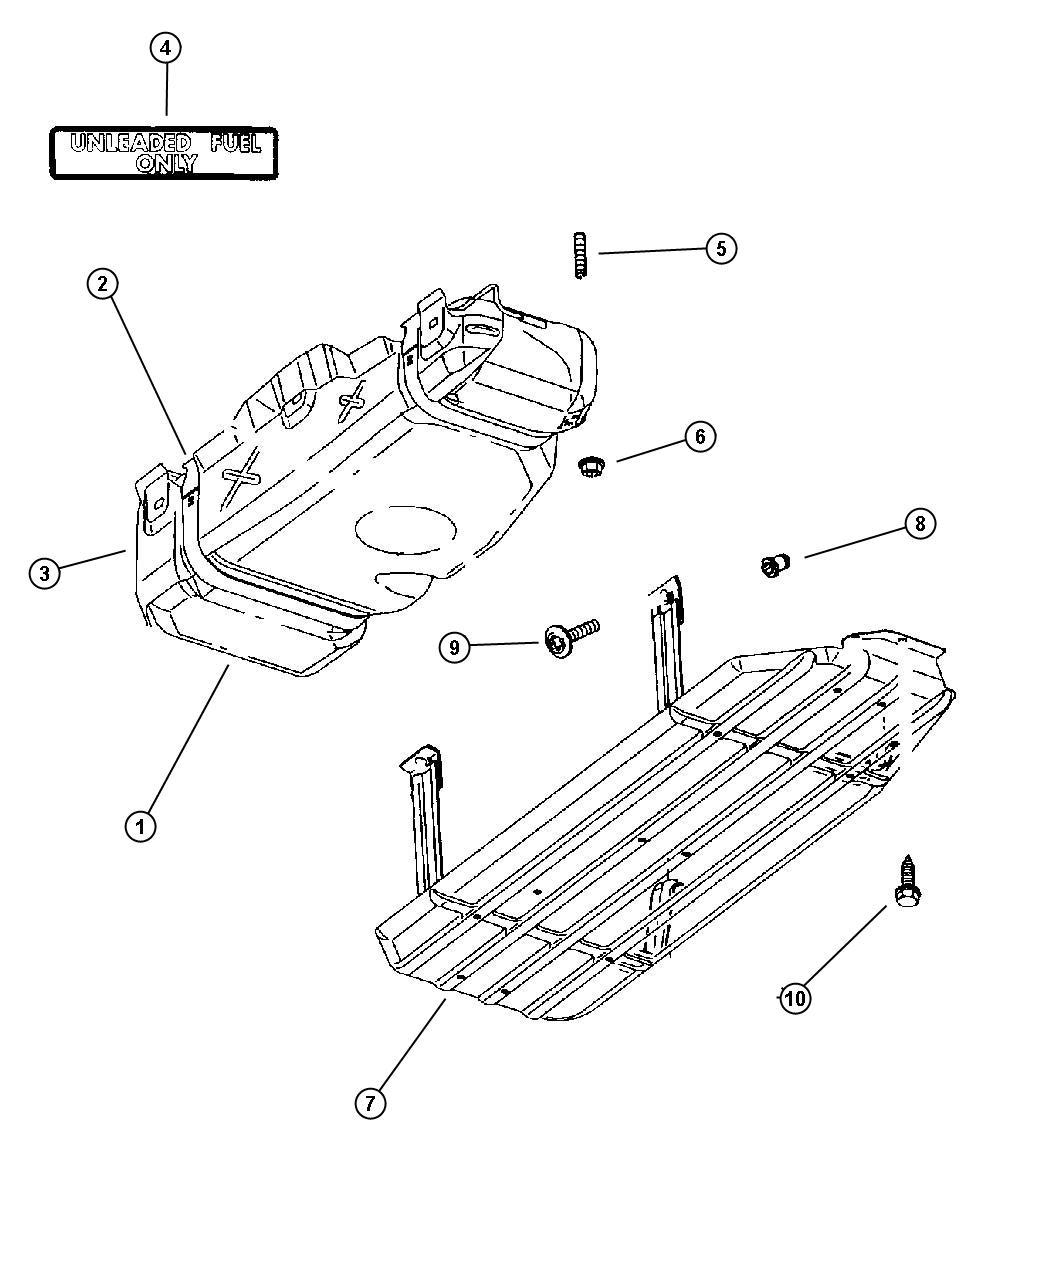 Service Manual Remove Fuel Tank On A Dodge Durango